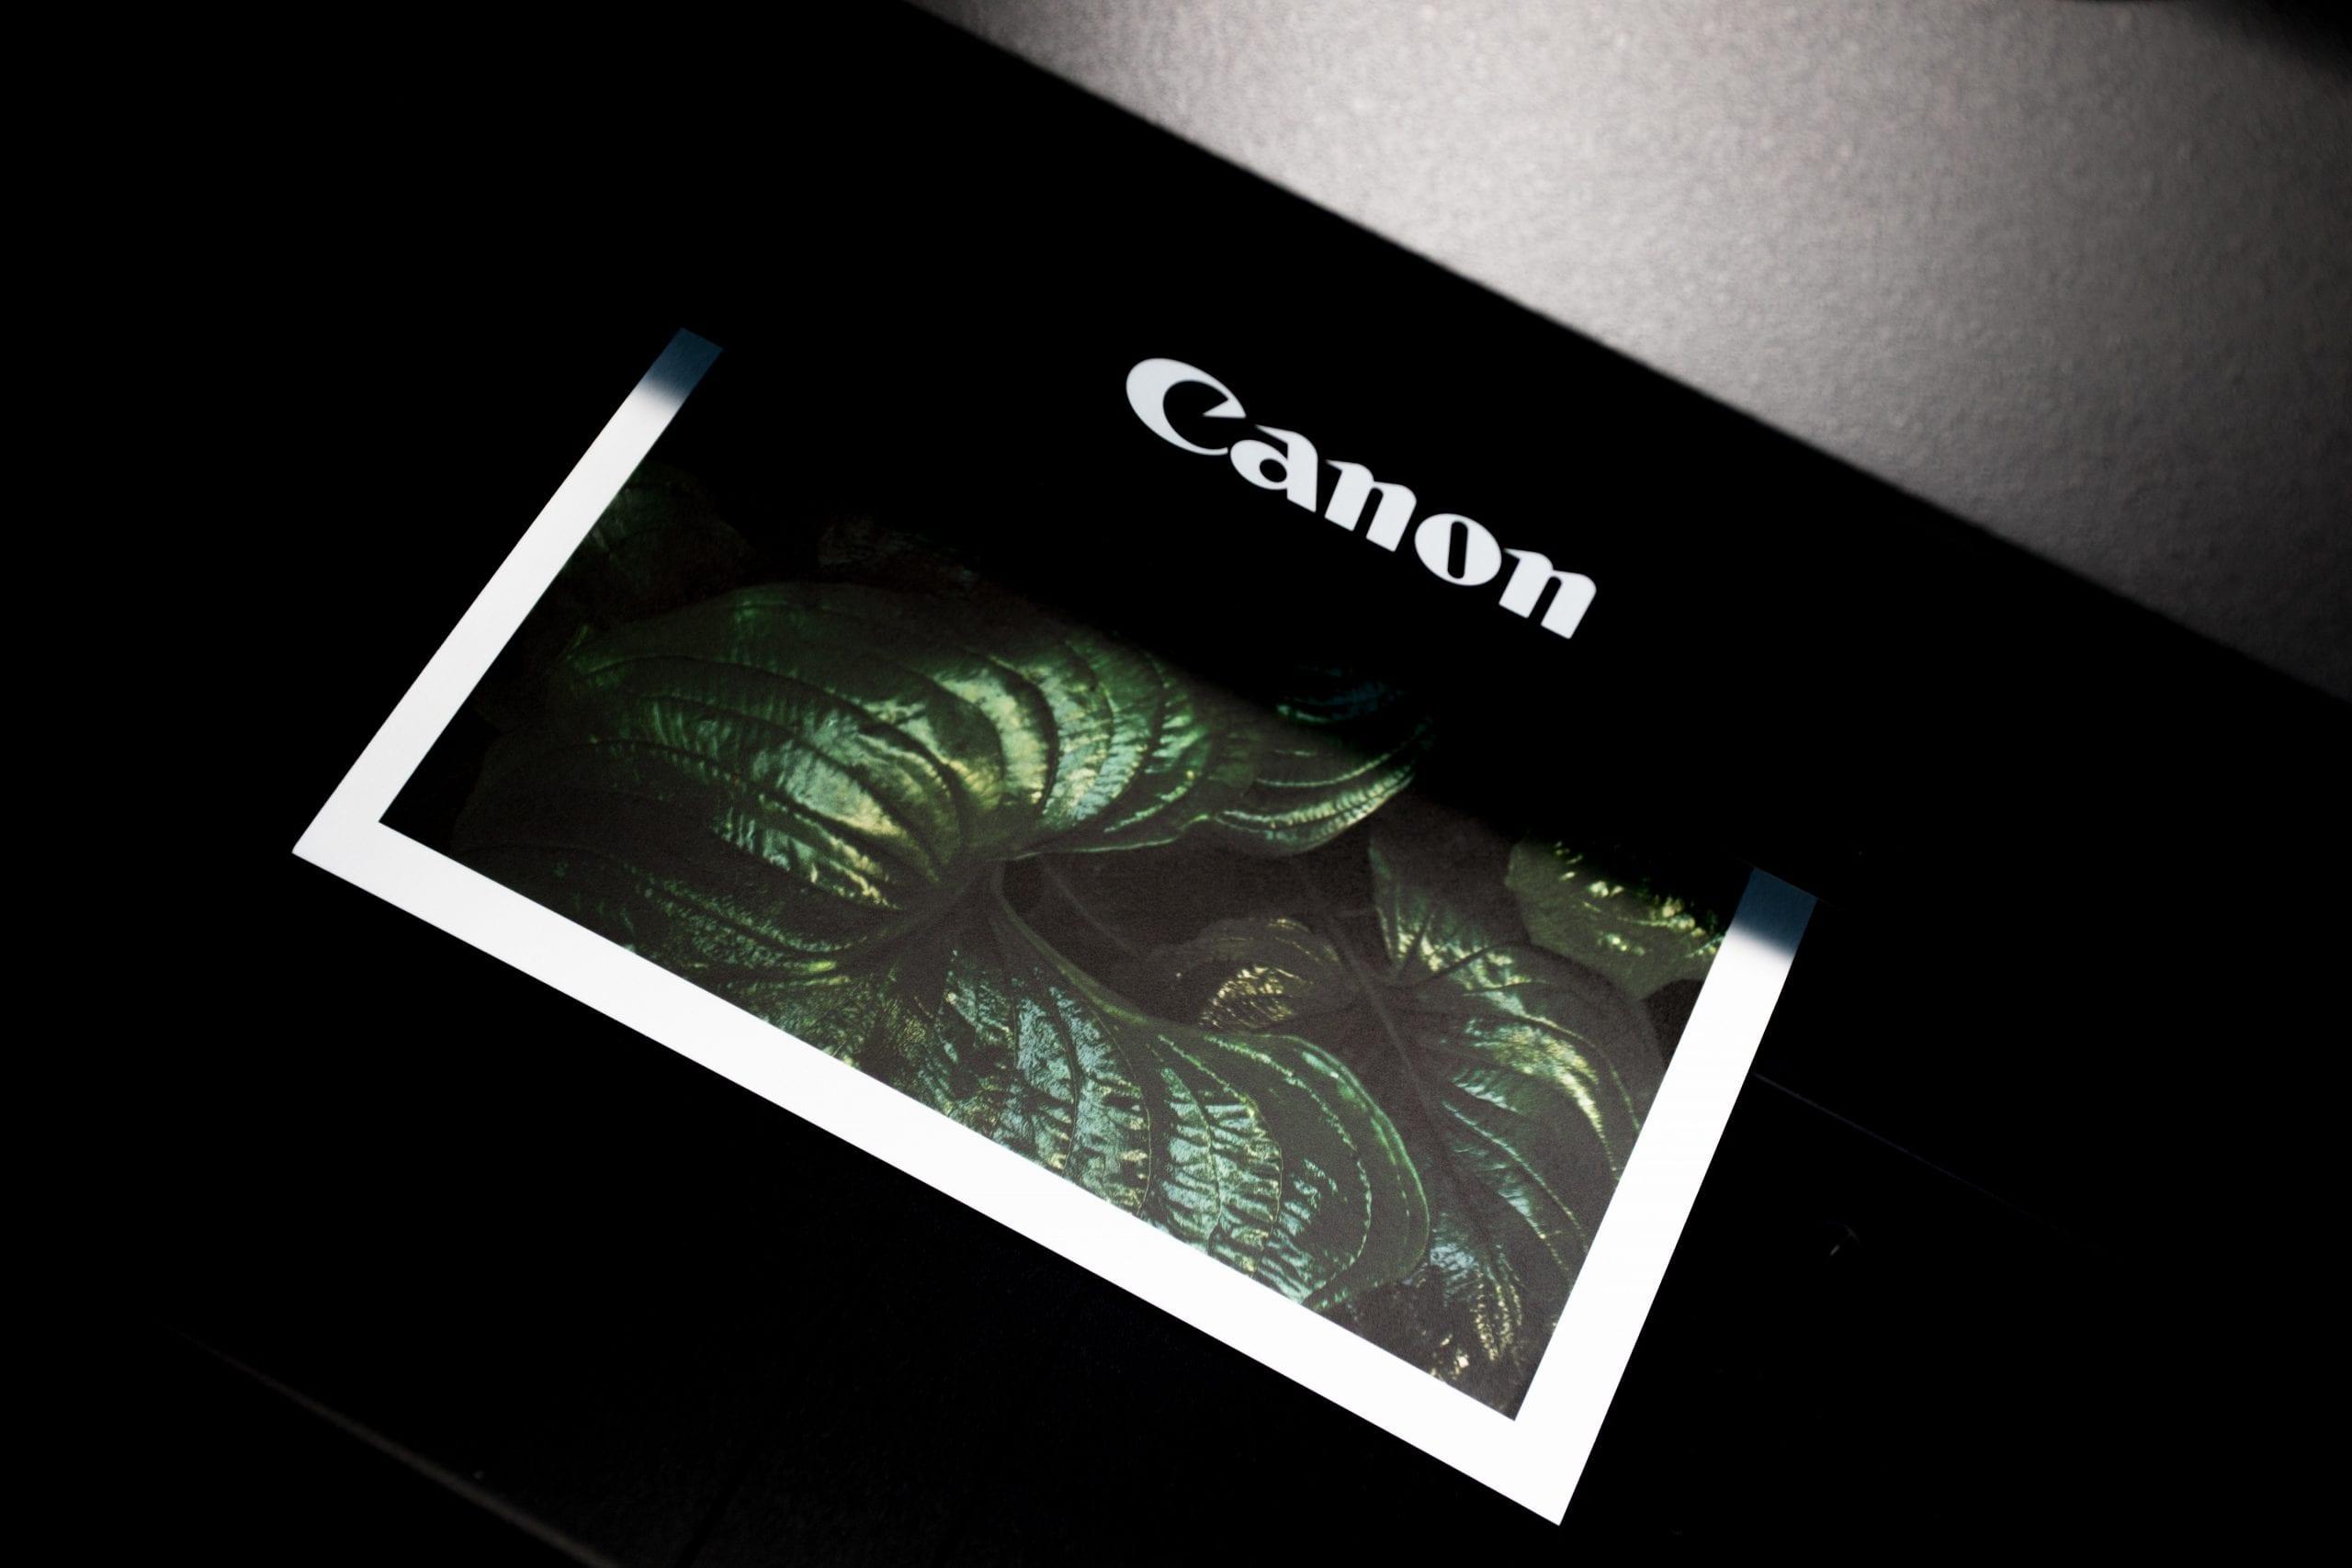 Photo Printer scaled